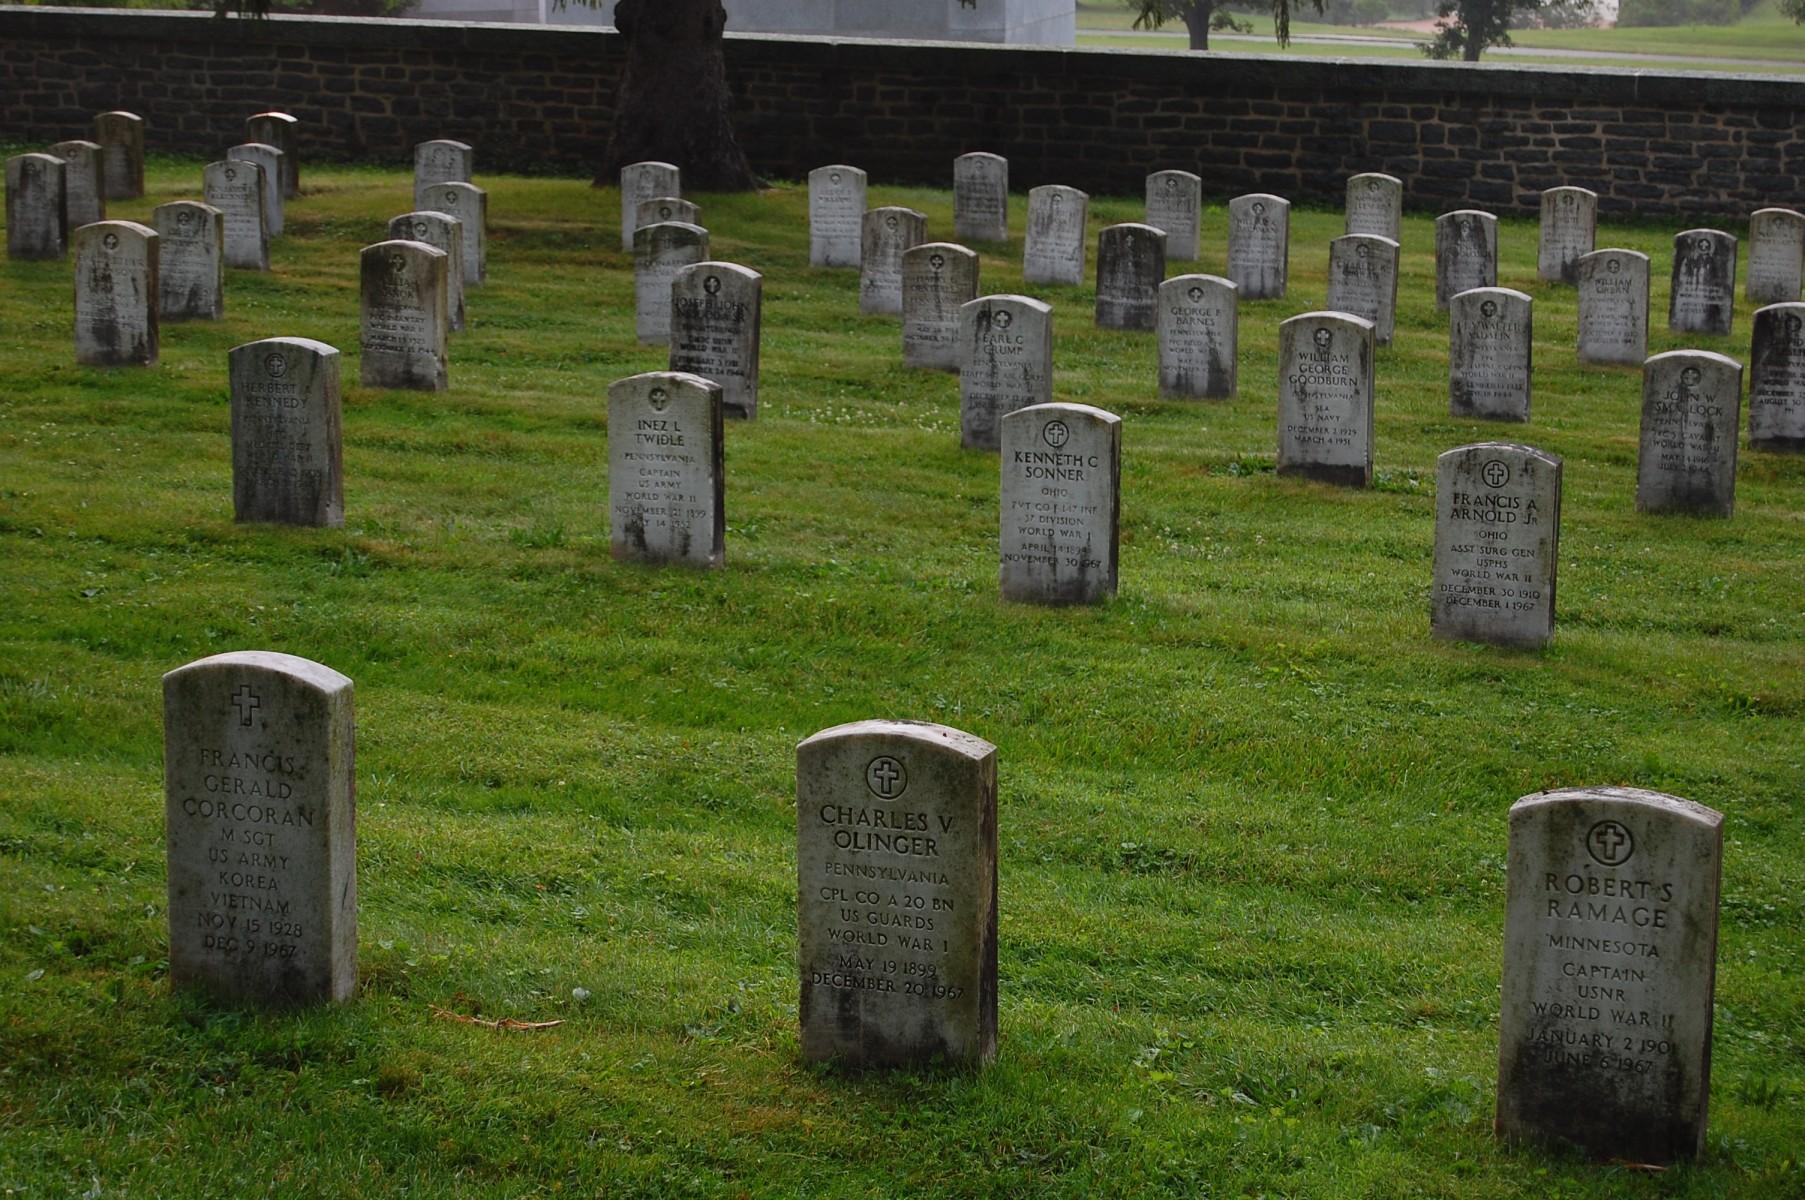 Soldiers National Cemetery Headstone Cleaning Gettysburg